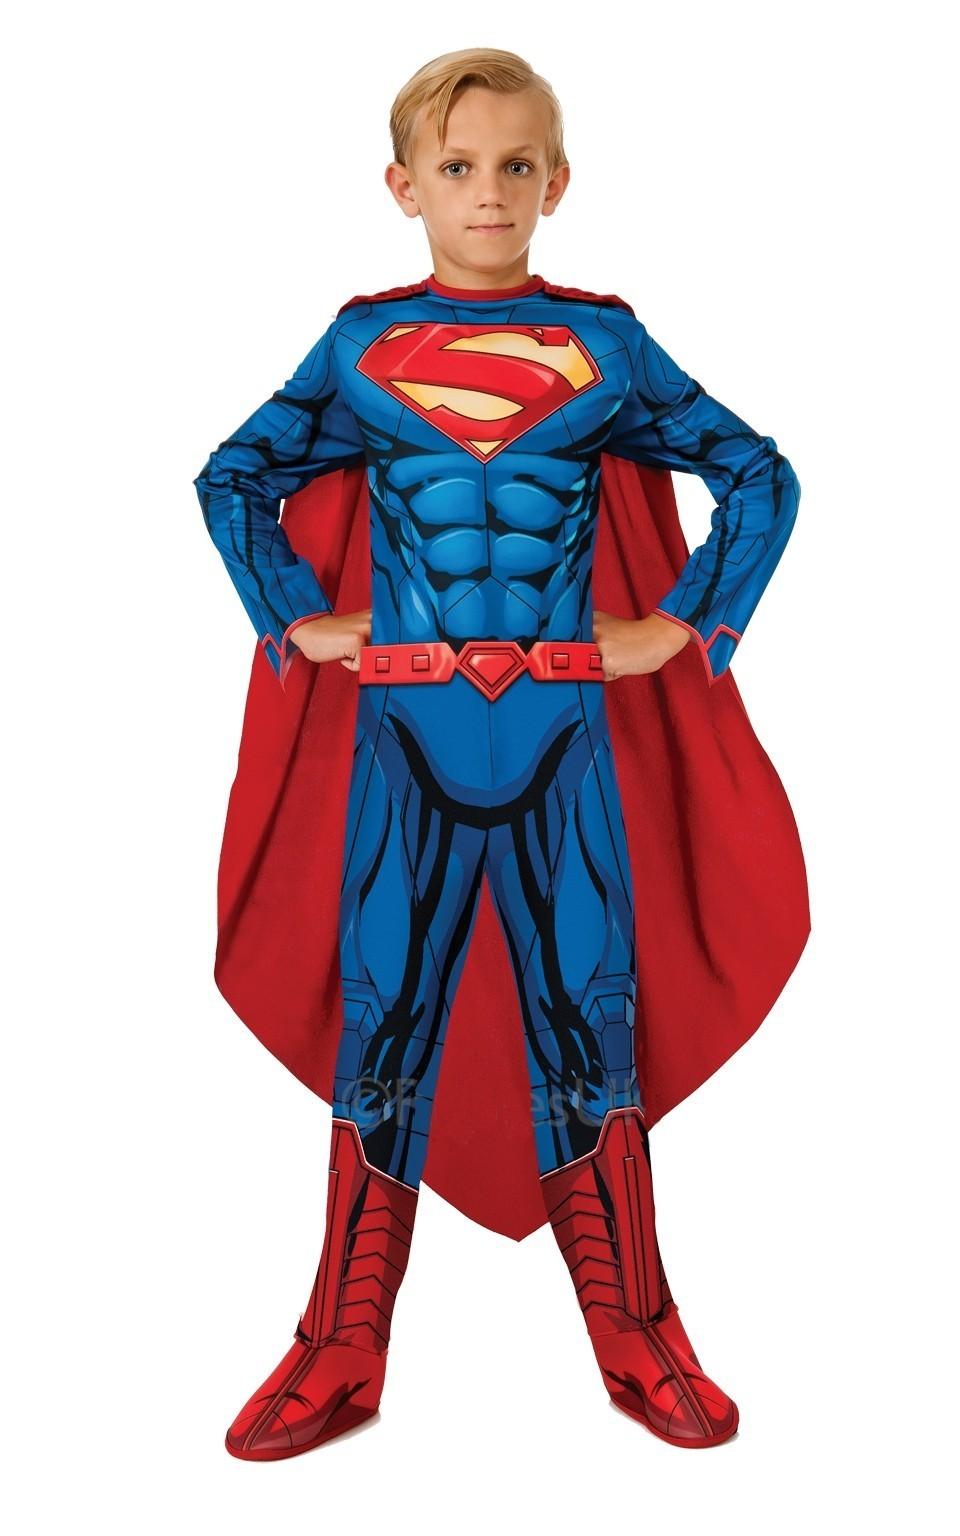 Детский костюм Супермен (30) детский костюм озорного клоуна 34